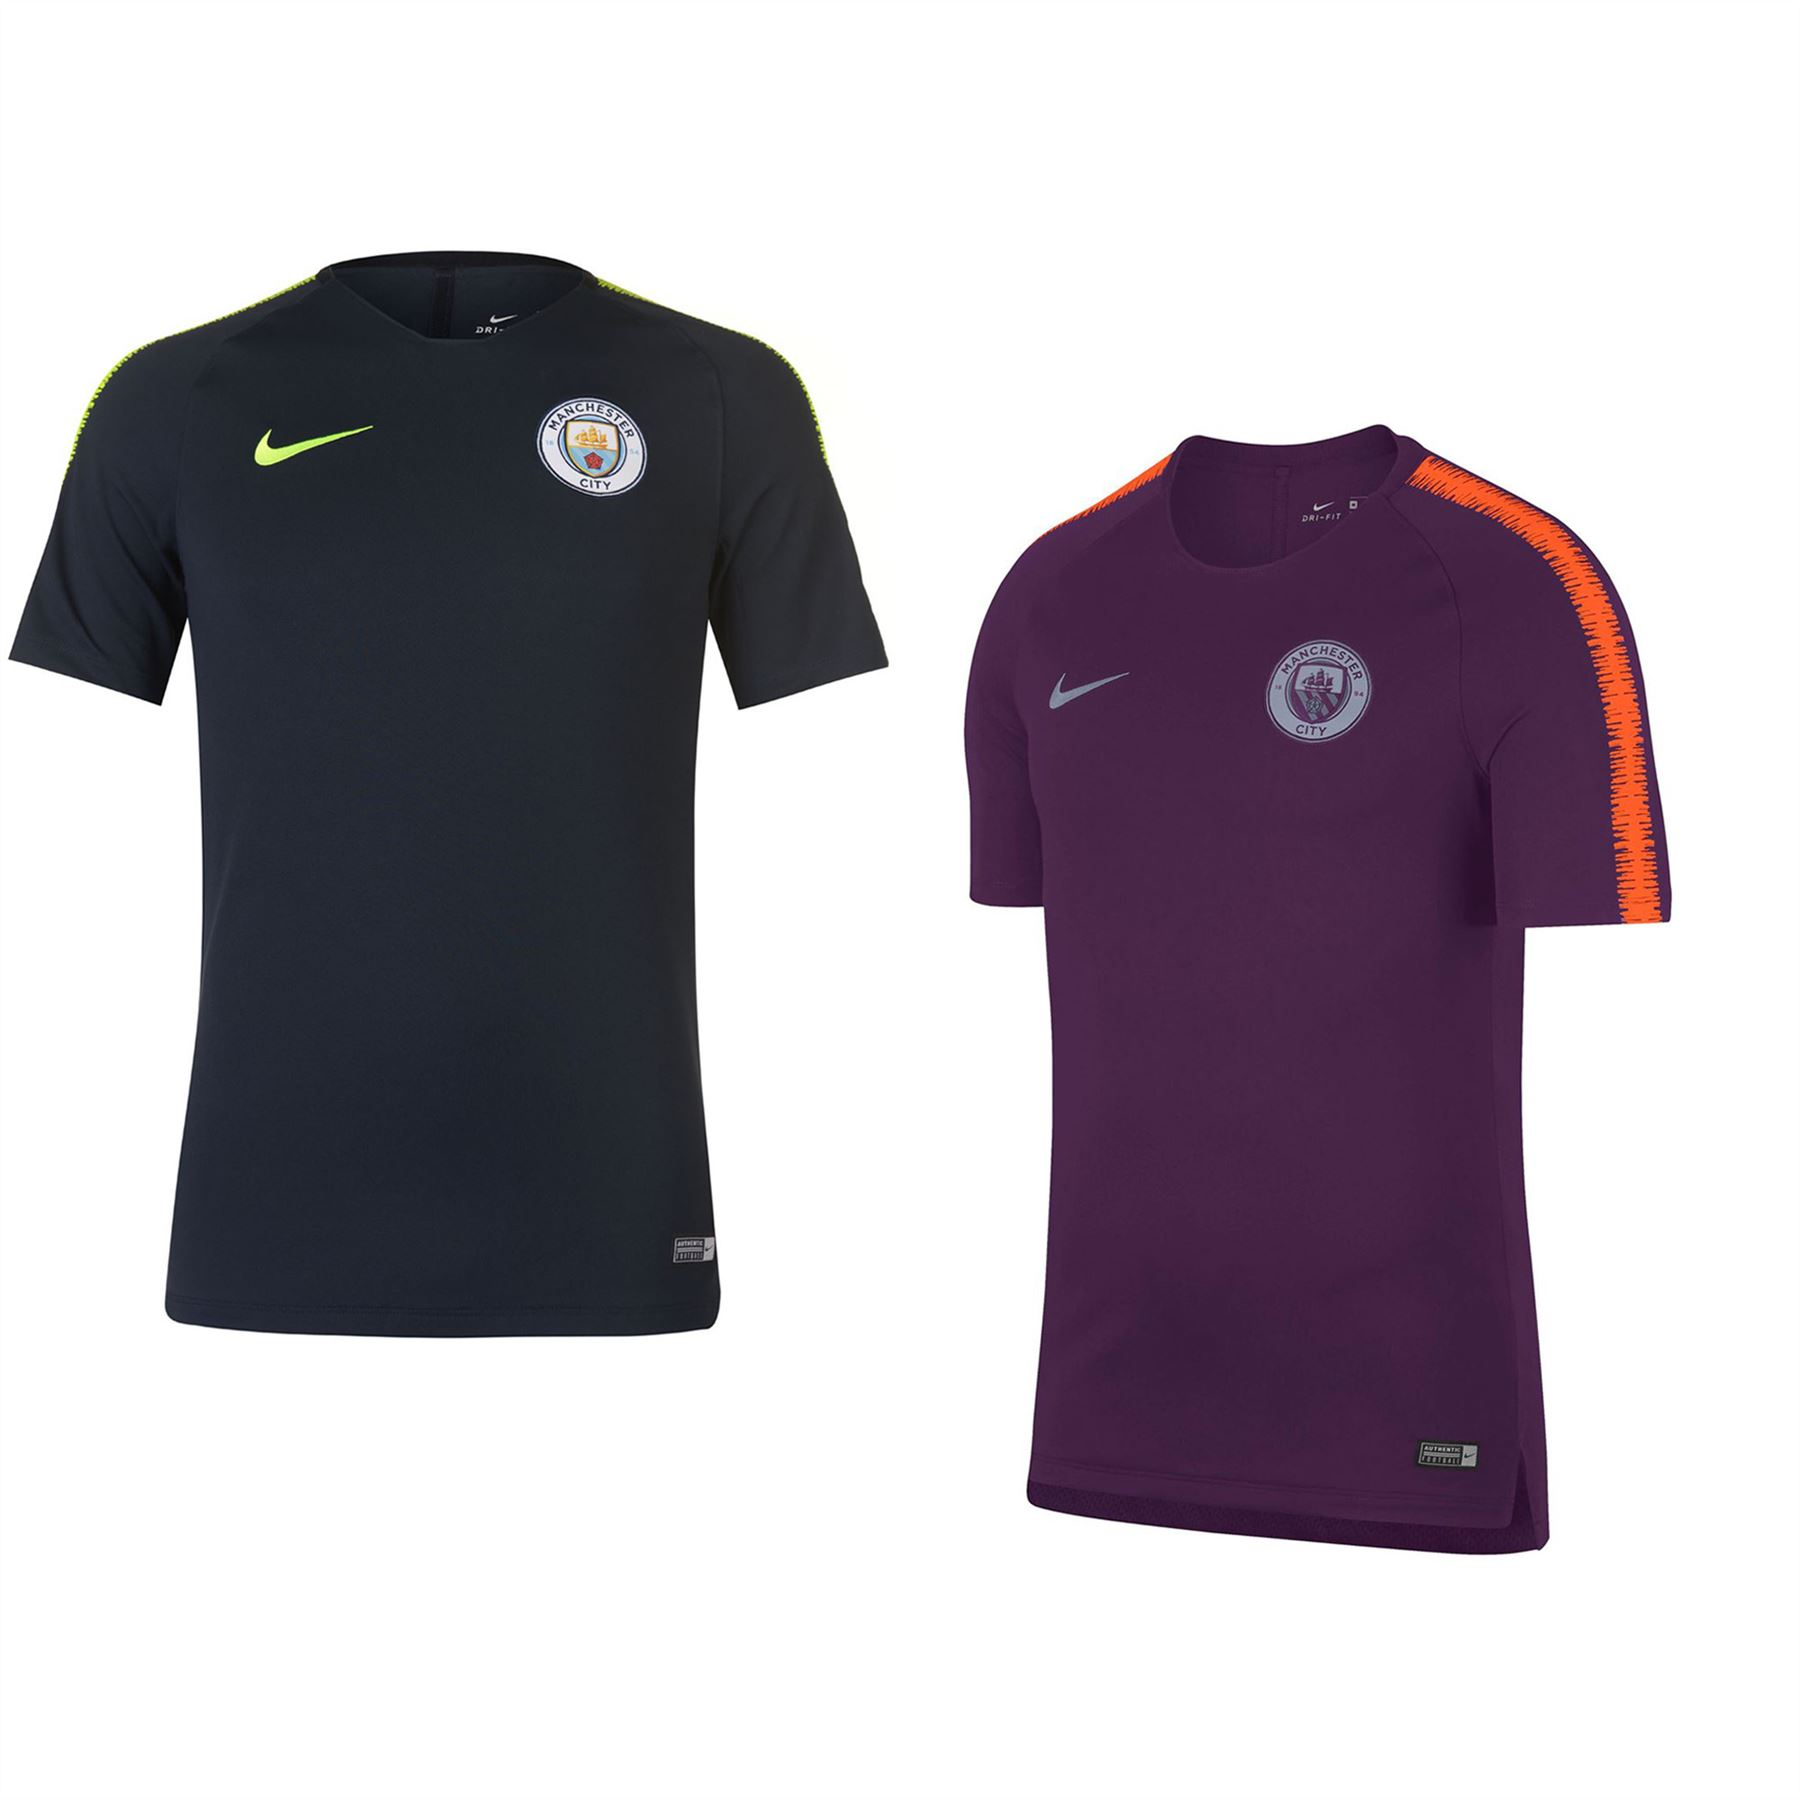 b0f50ab5e Nike Manchester City Squad T-Shirt 2018 2019 Mens Football Soccer Top Tee